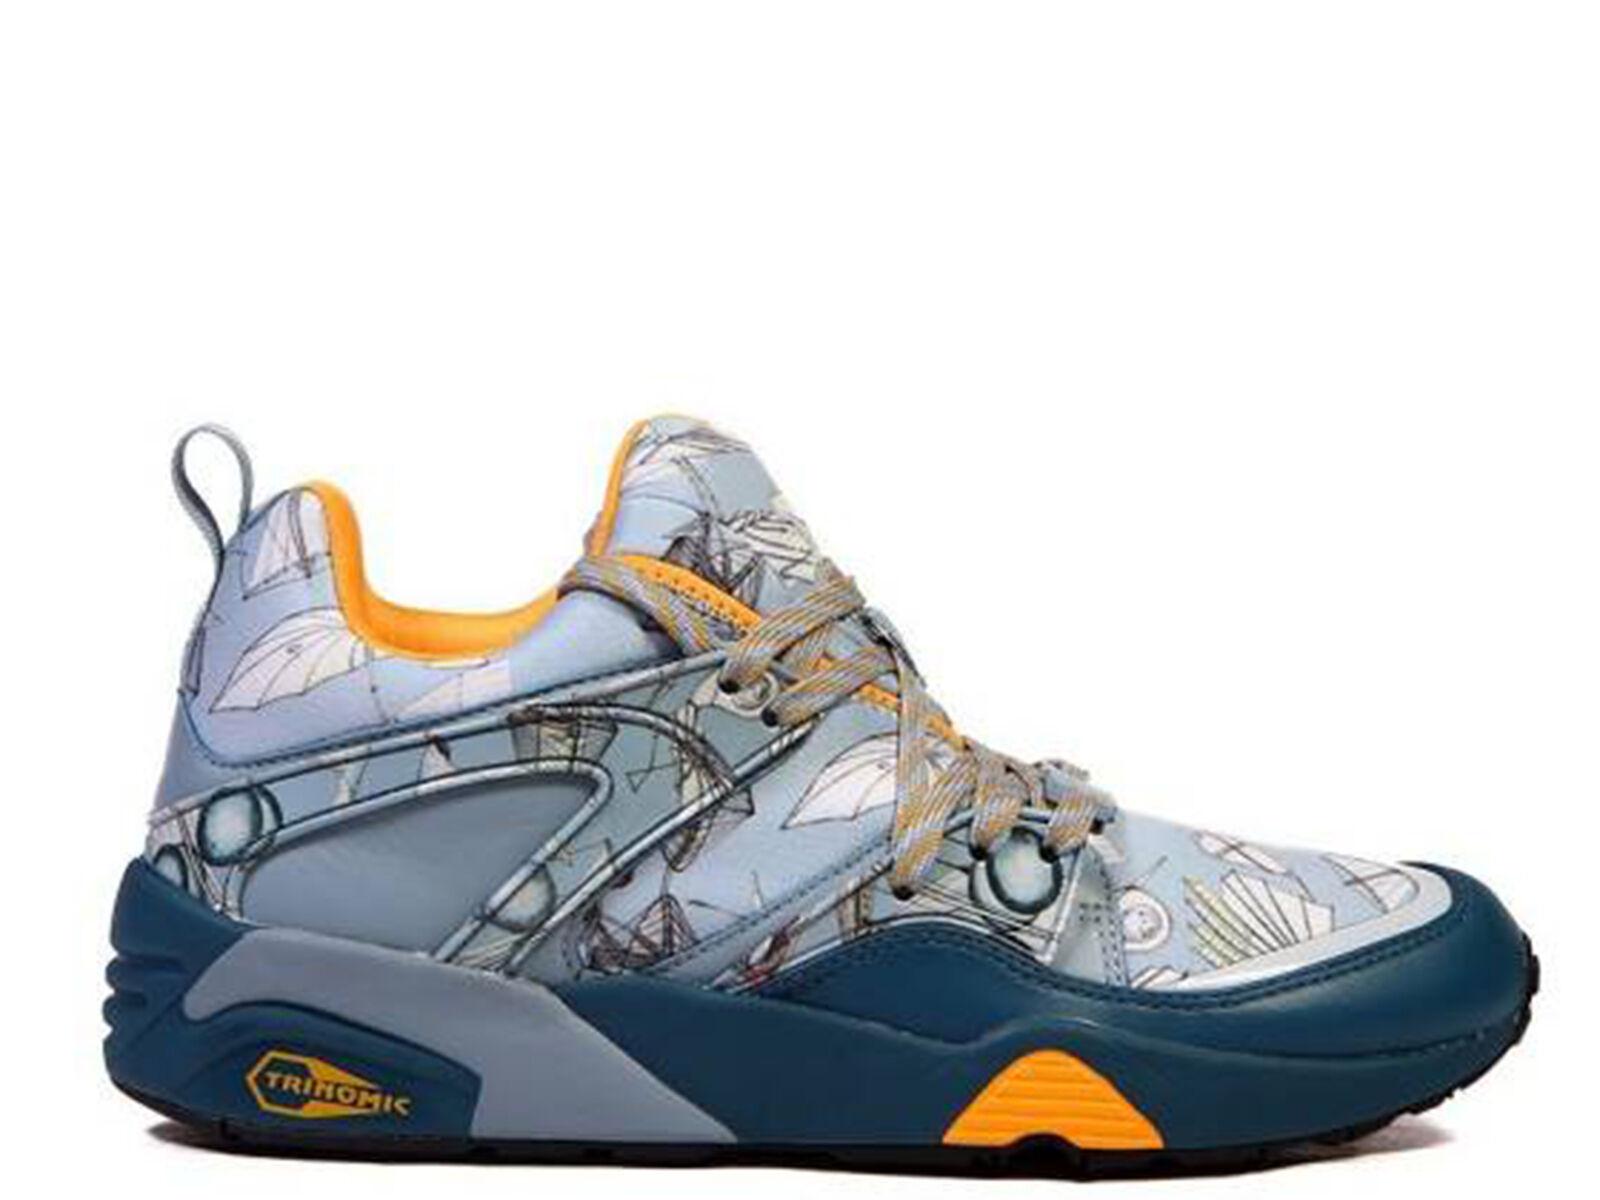 Brand New Puma Blaze of Glory X Swash Mens Athletic Fashion Sneakers [358860 01]